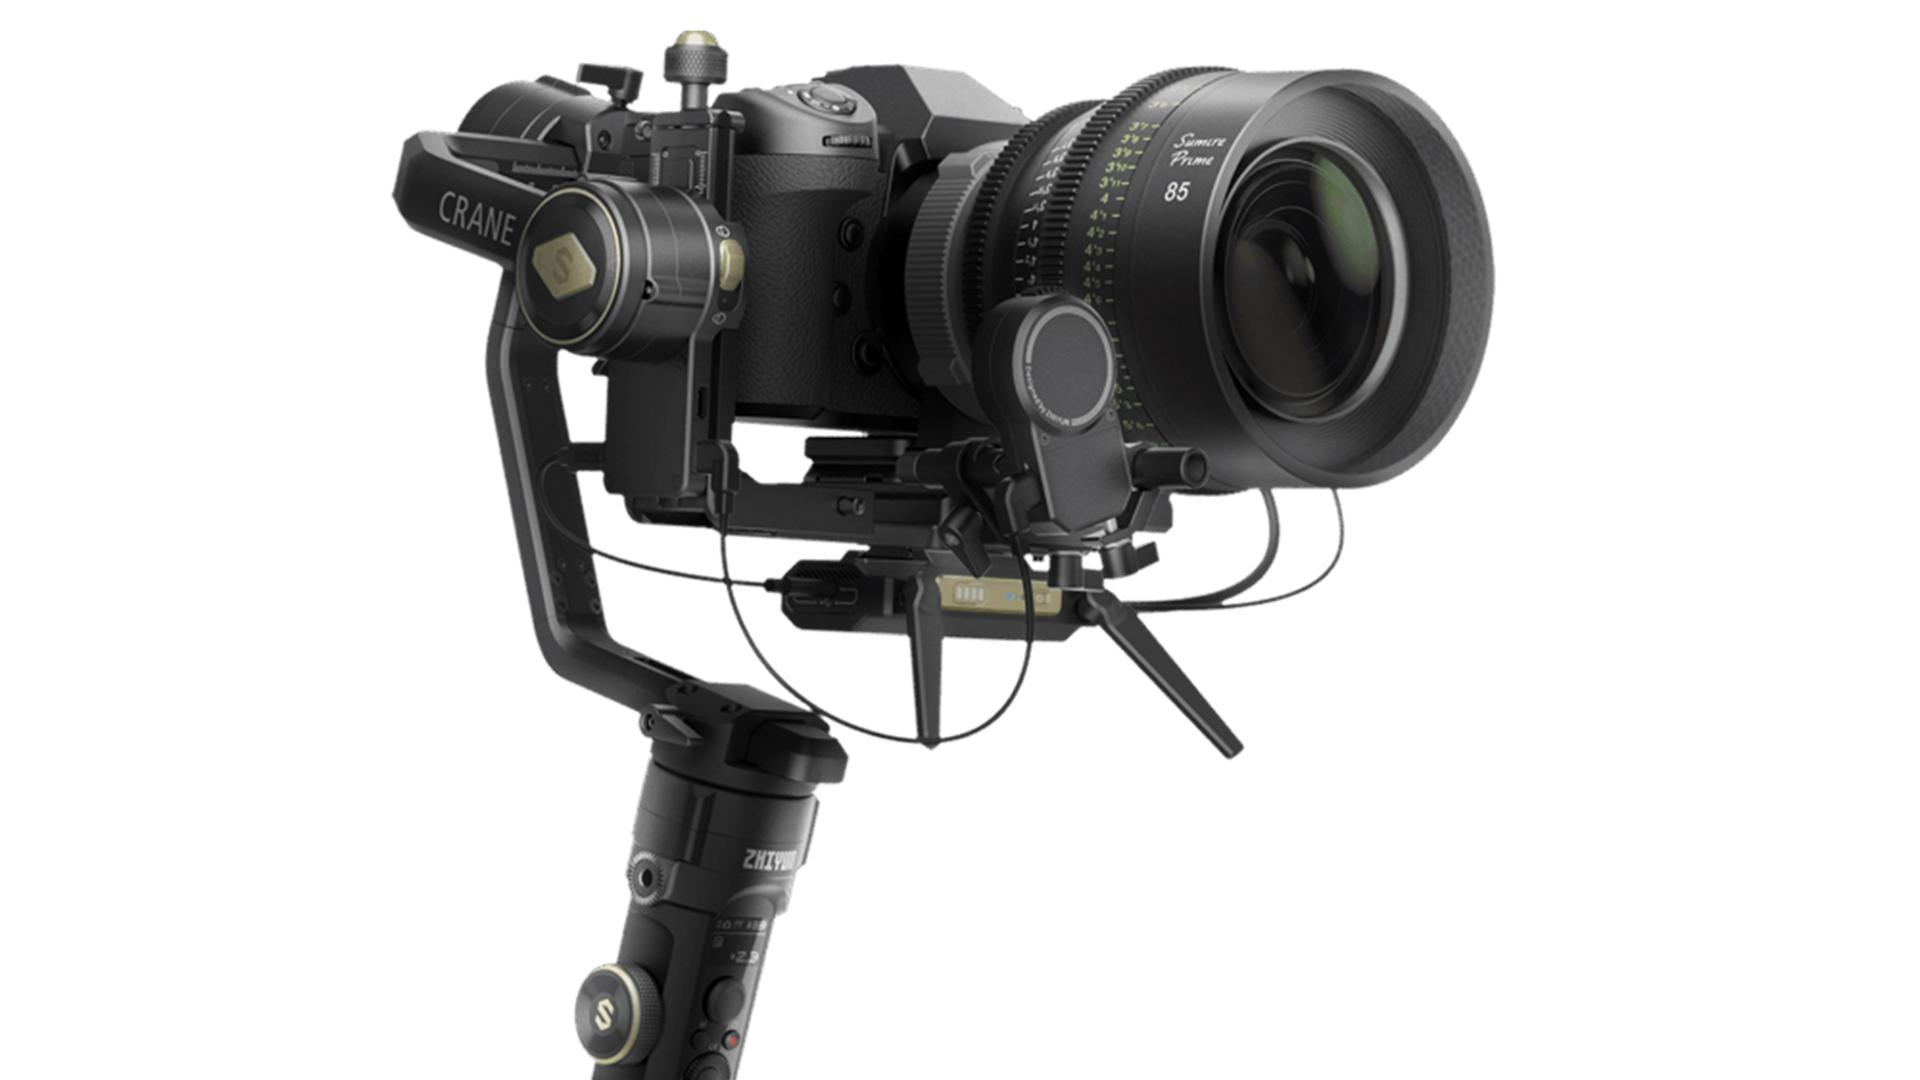 zhiyun crane 2s camera gimbal